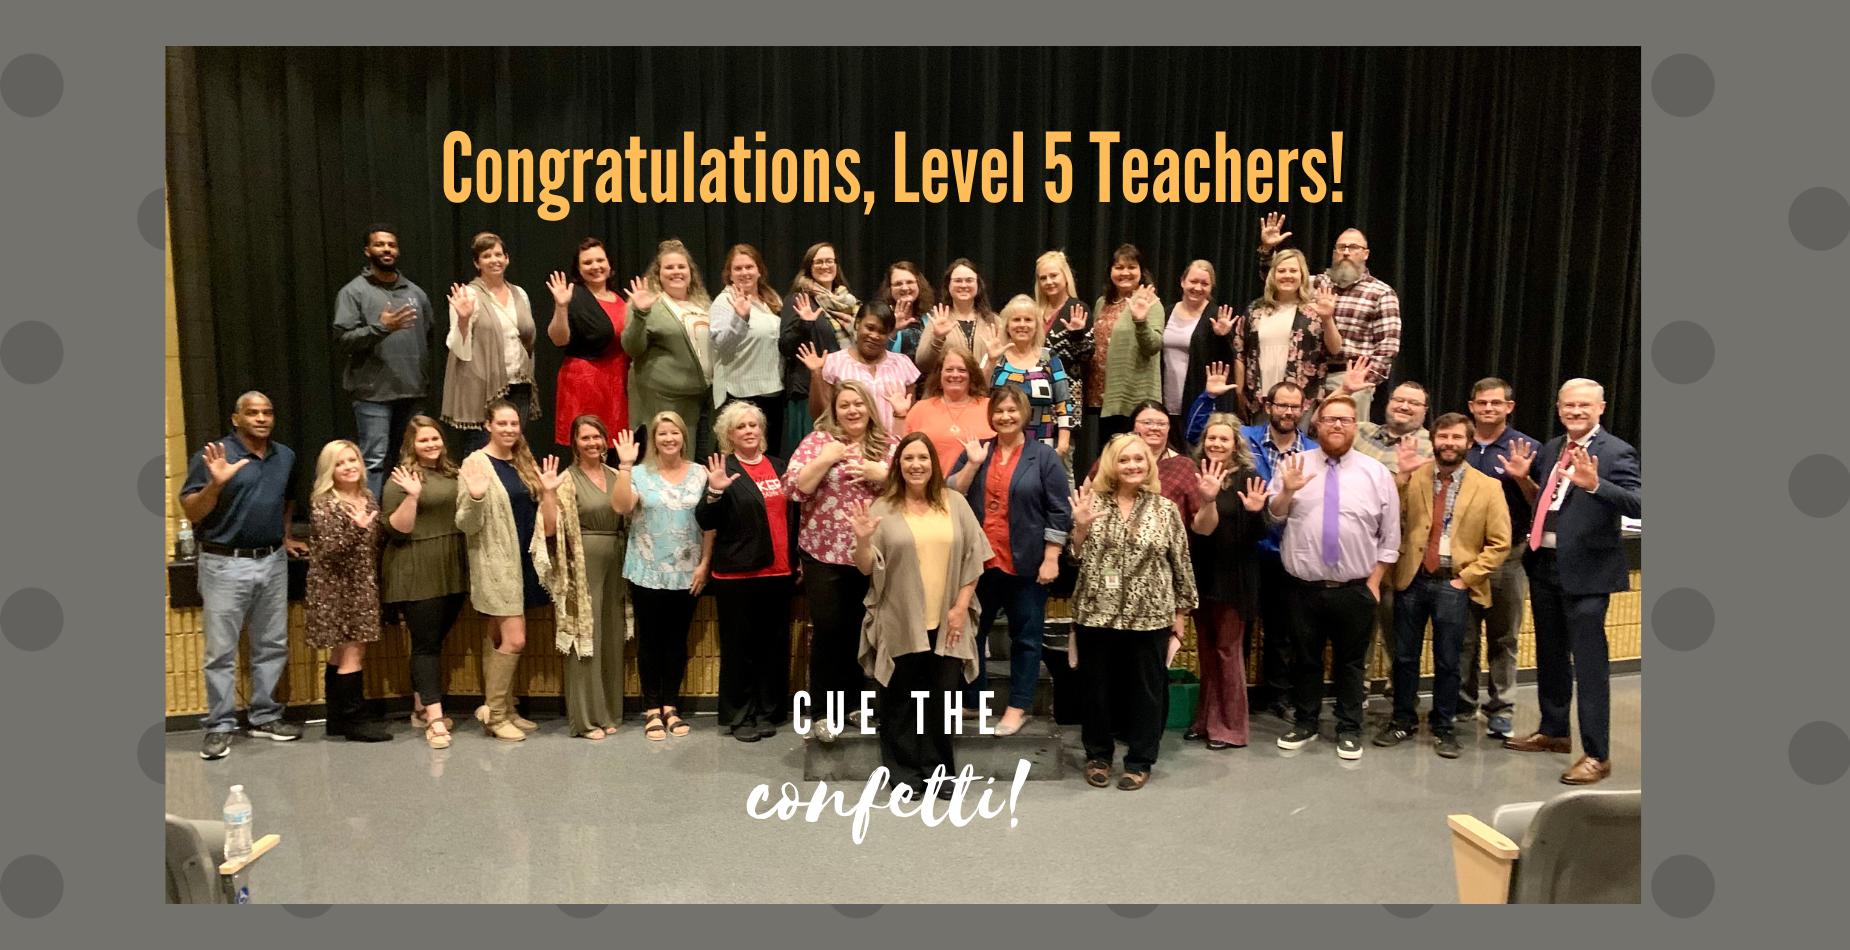 Level 5 Teachers